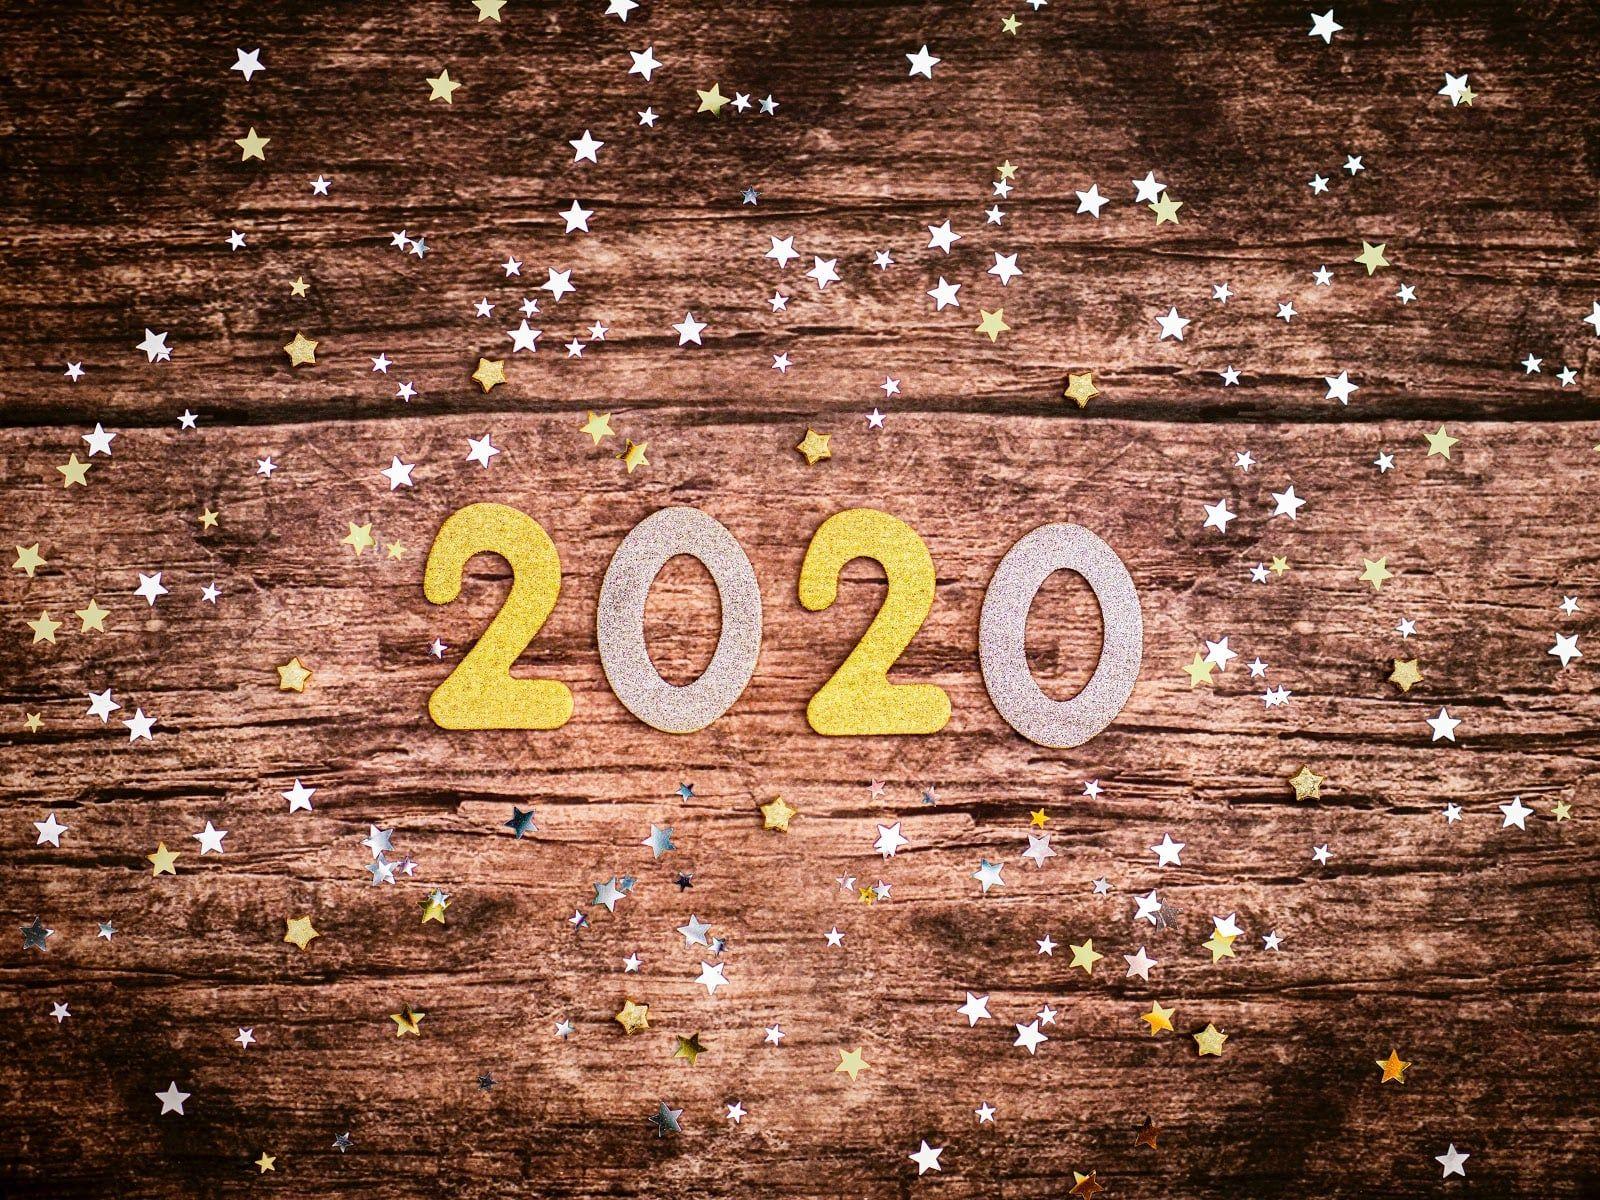 2020 Packaging Design Trends